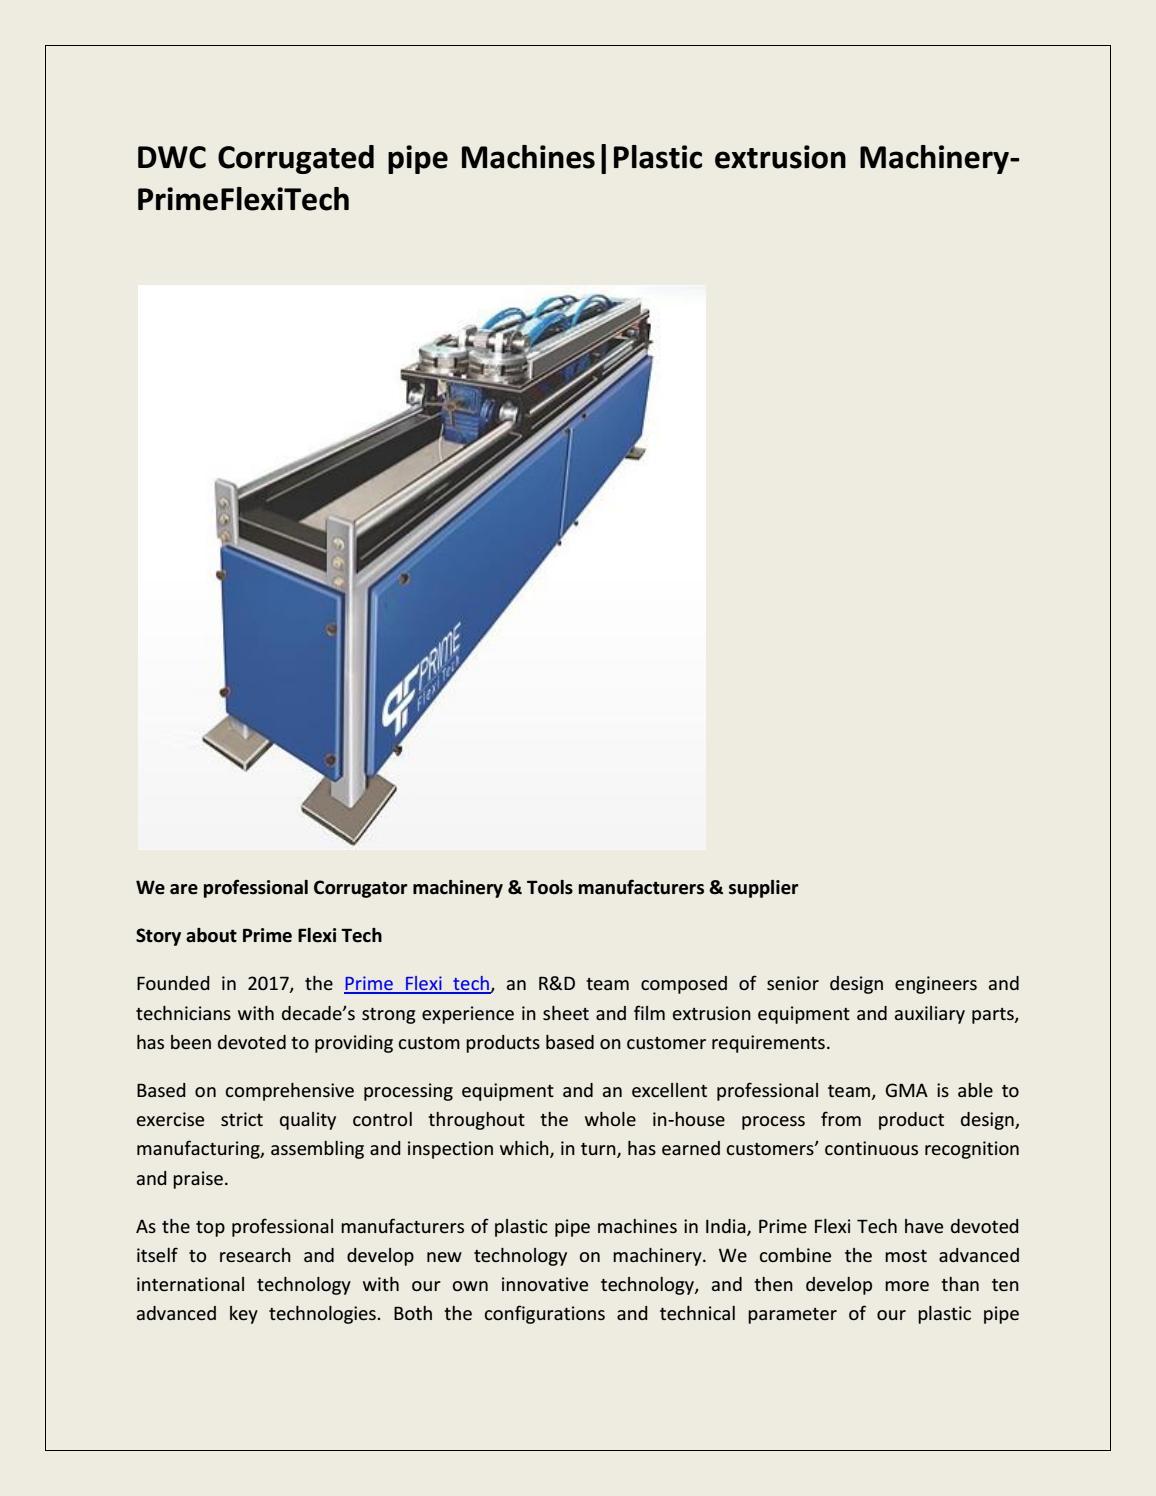 DWC Corrugated pipe Machines|Plastic extrusion Machinery